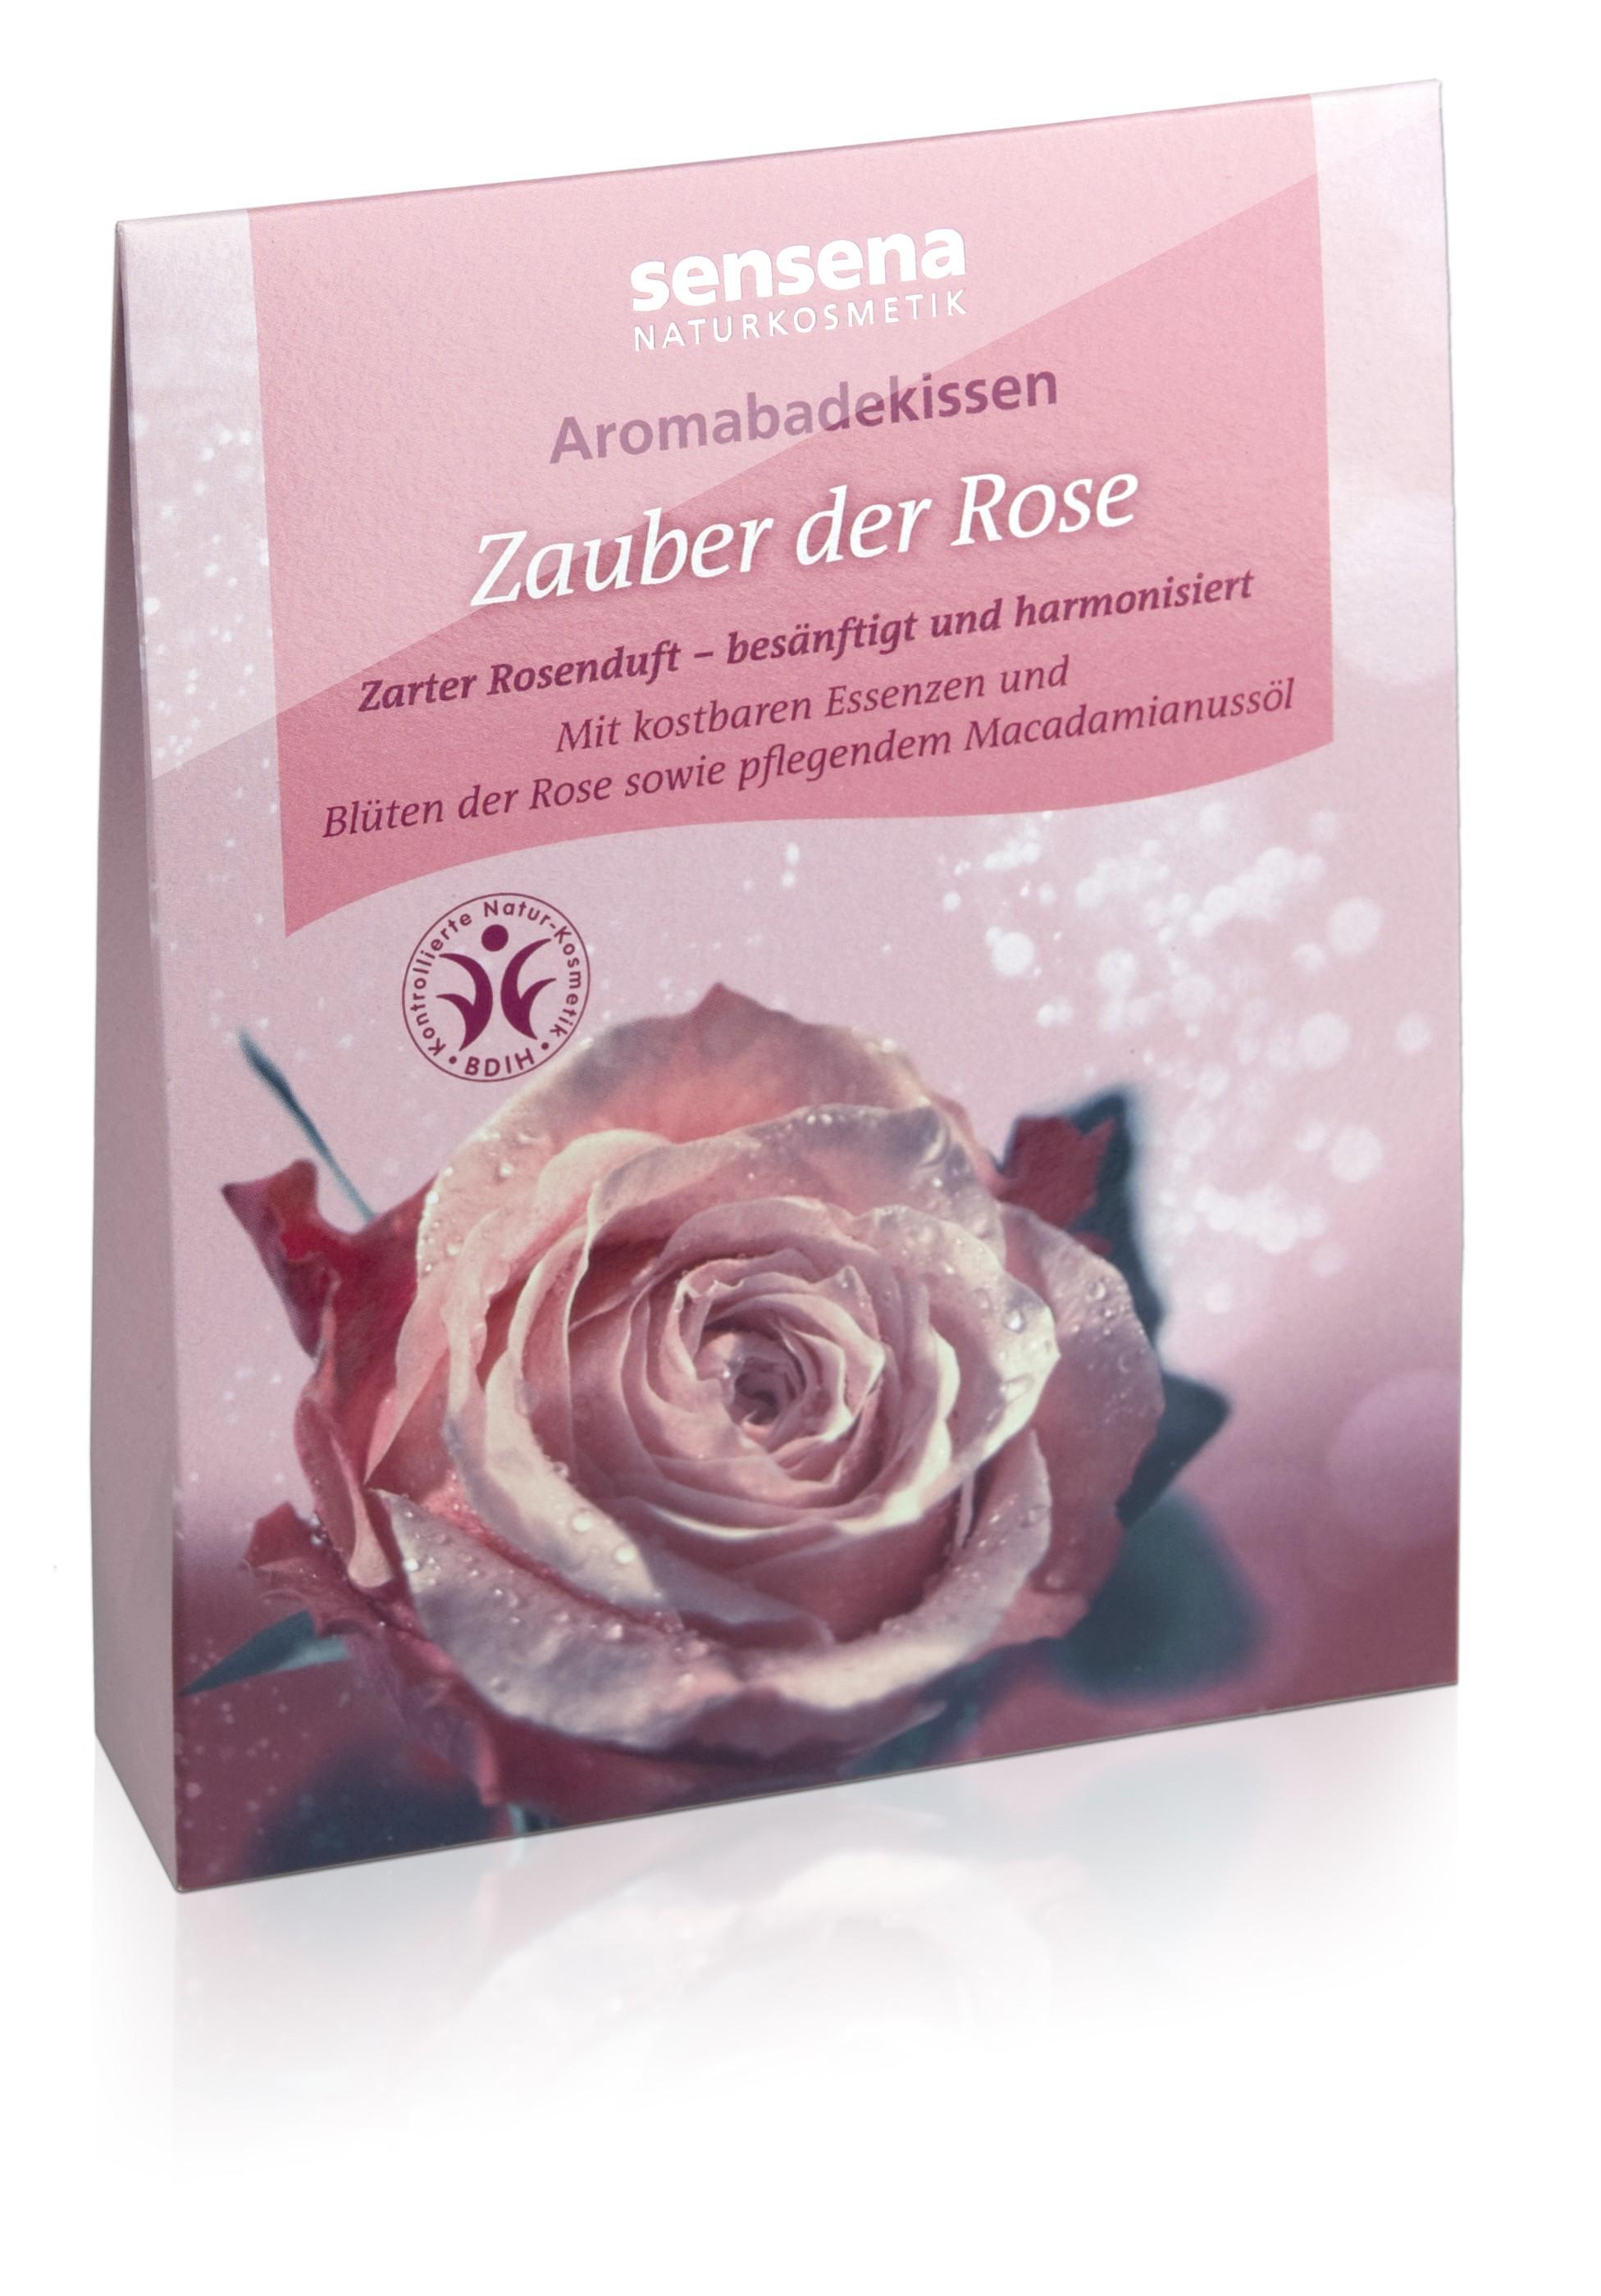 Aromabadekissen Zauber der Rose